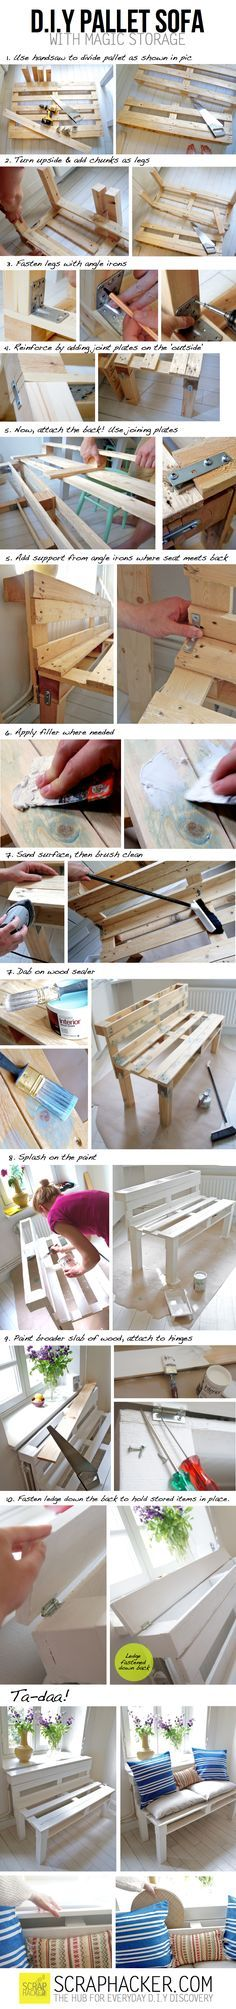 DIY Pallet Sofa Tutorial - Easy 10-Step DIY guide! What a wonderful step by step pic...